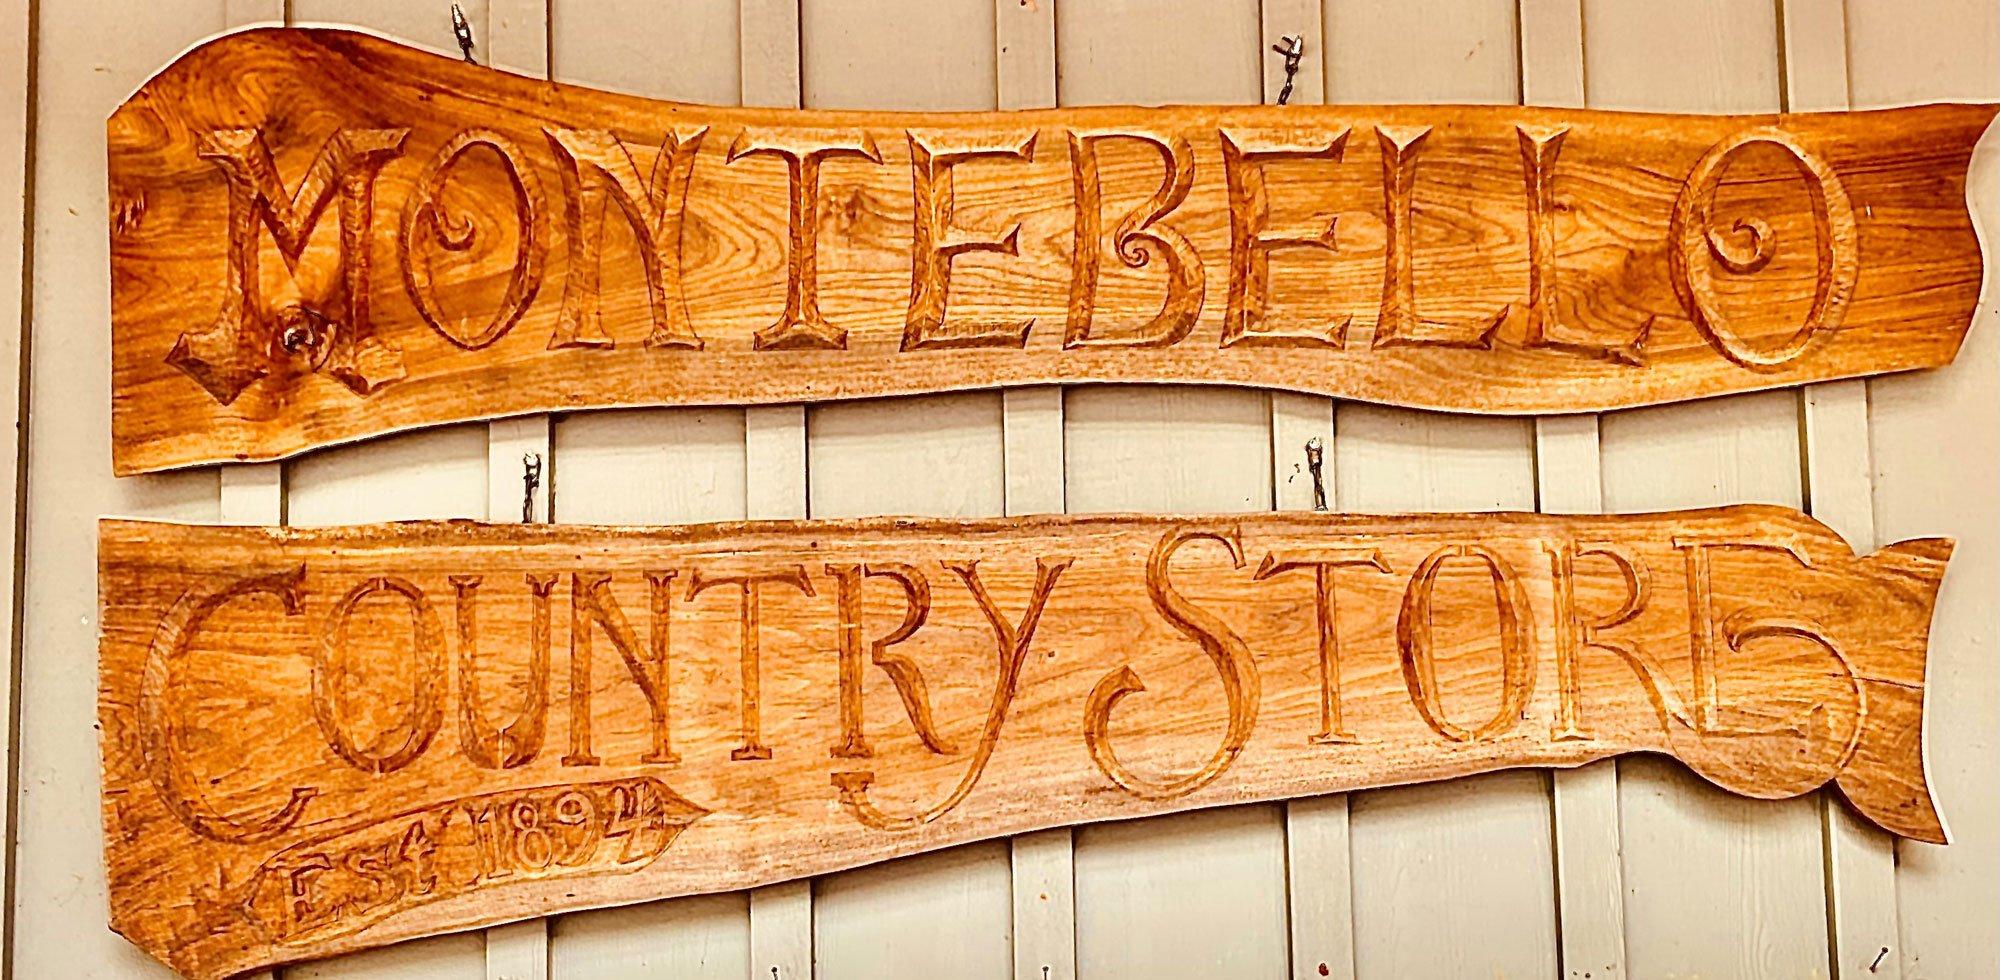 Montebello's Stre front sign